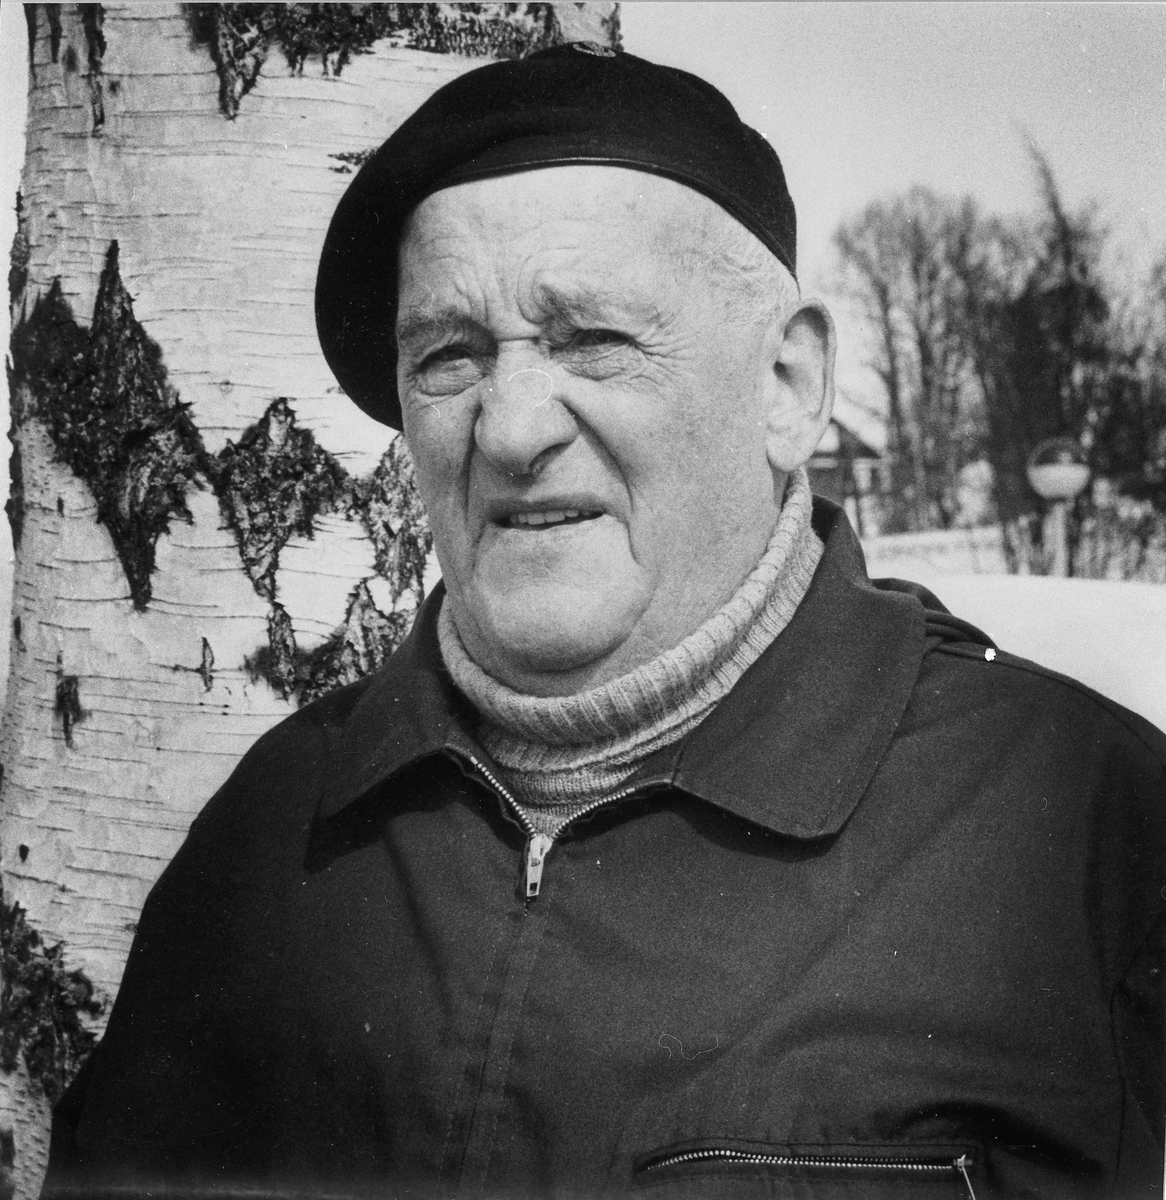 Olaf Linnerud. Leder av troppen Finstad/Dal.